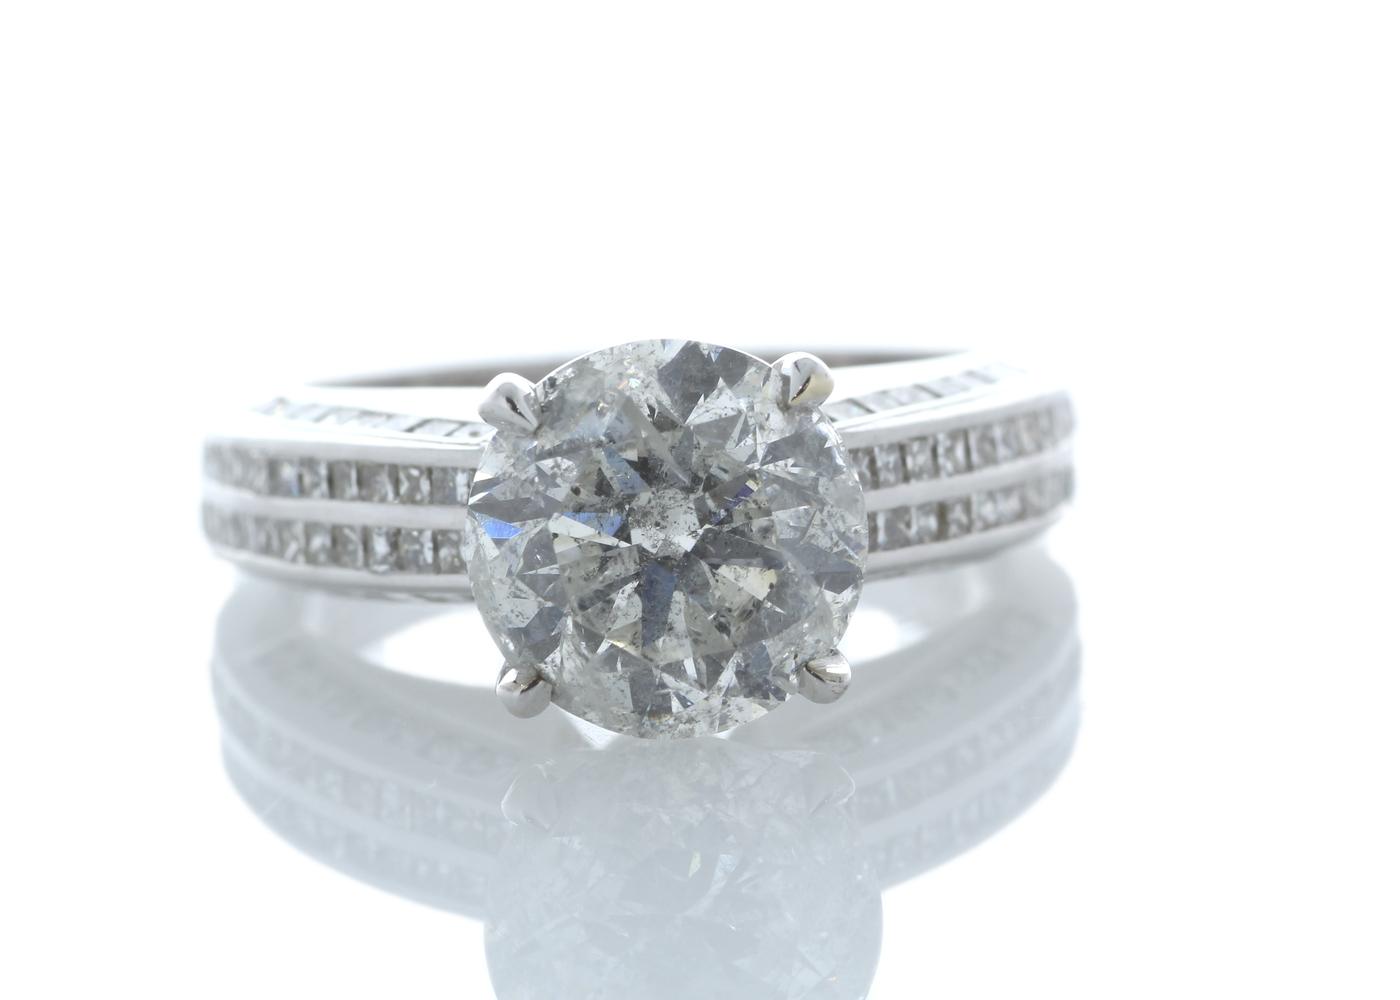 Lot 28 - 18ct White Gold Stone Set Shoulders Diamond Ring 4.51 Carats